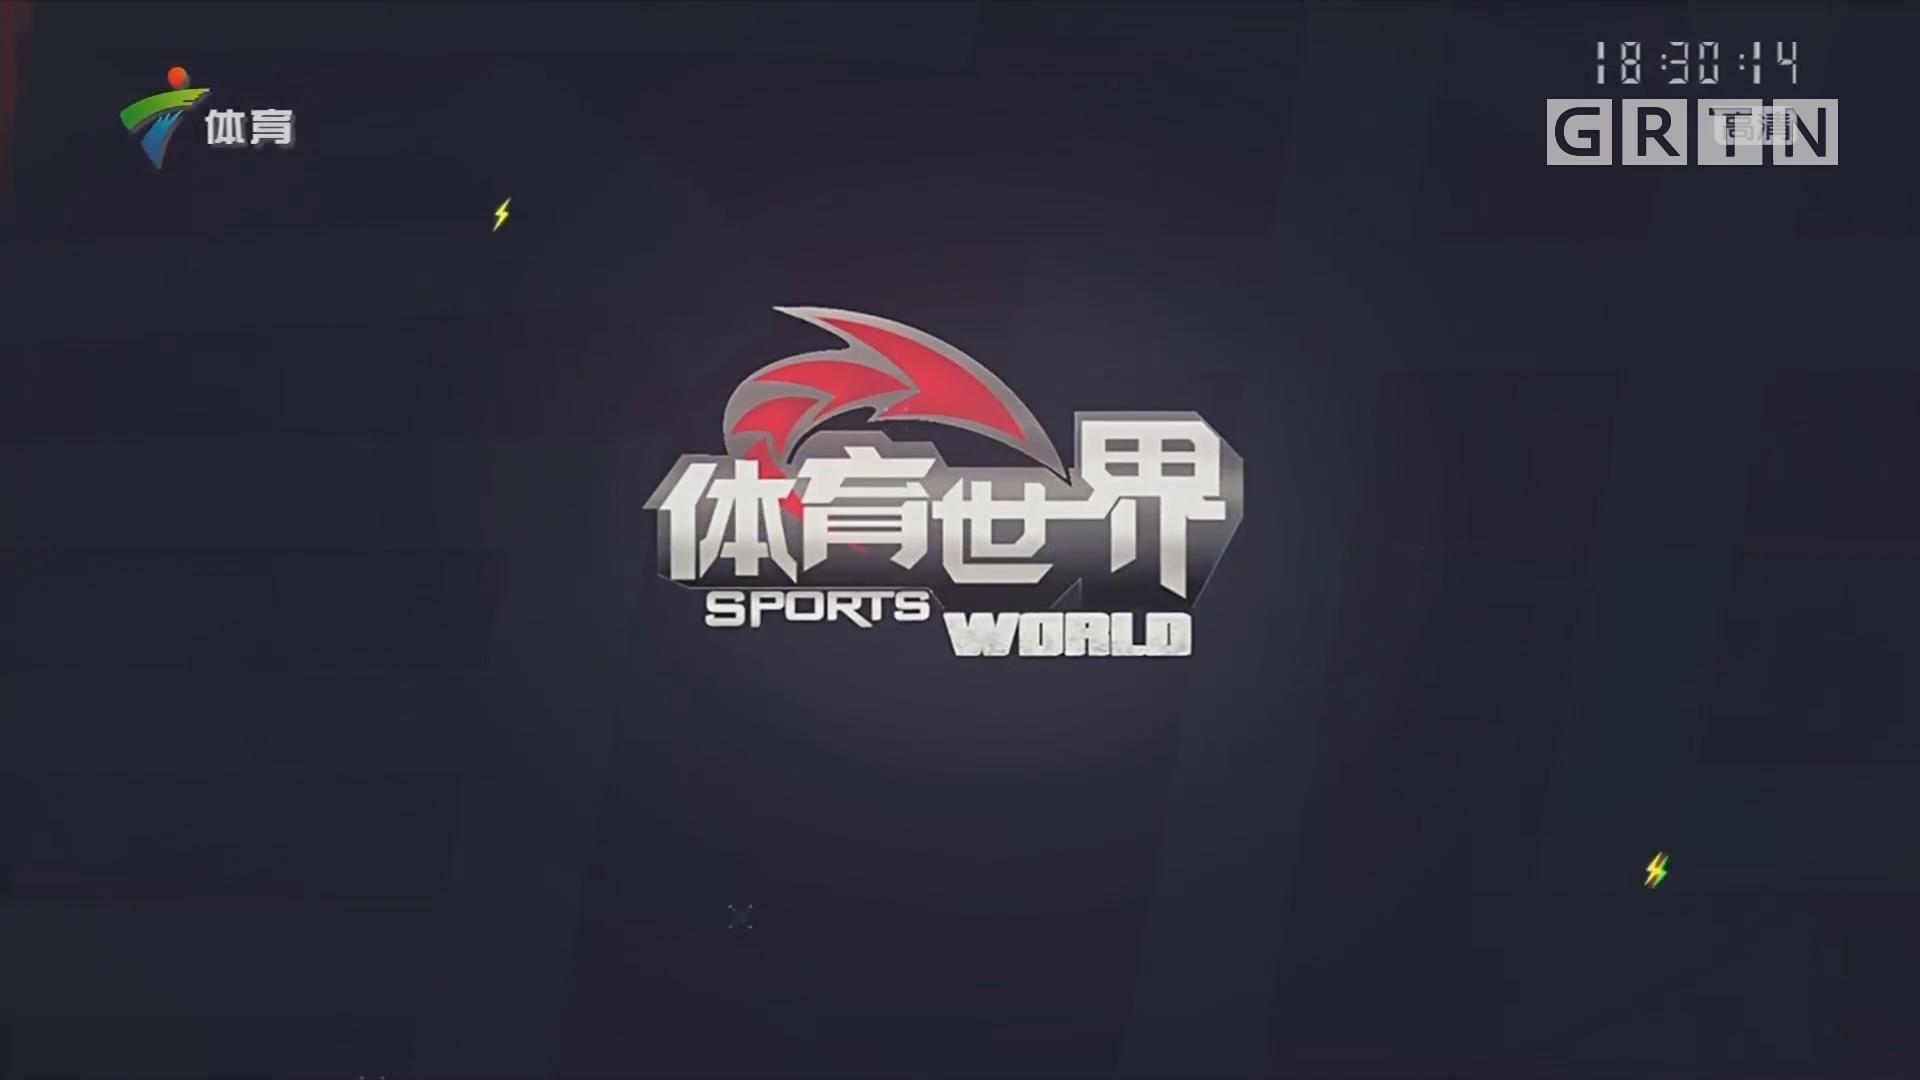 [HD][2019-02-20]体育世界:粤港两地马术发展密不可分